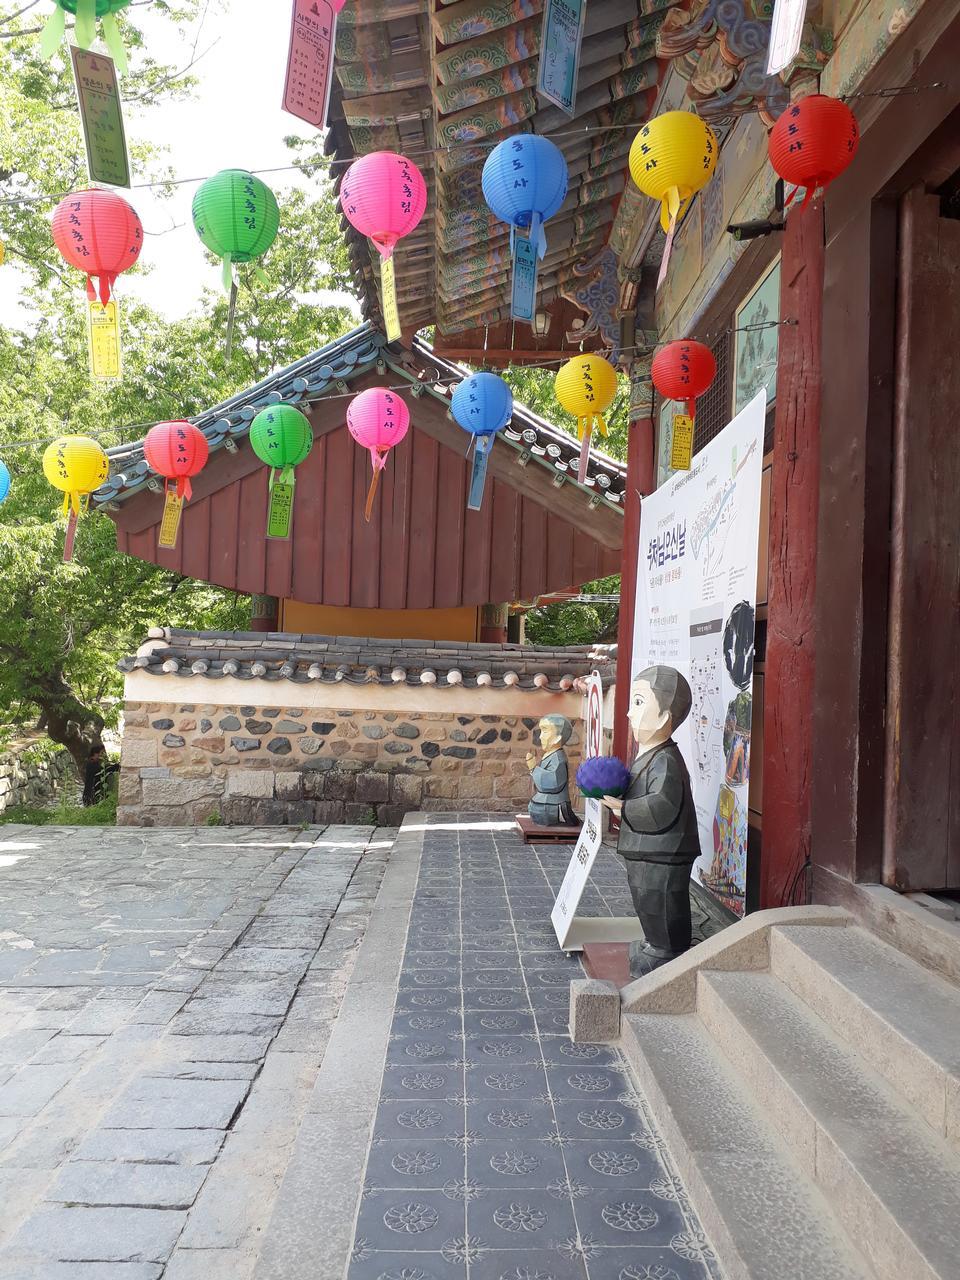 Lantern Tongdosa Temple Yangsan South Korea